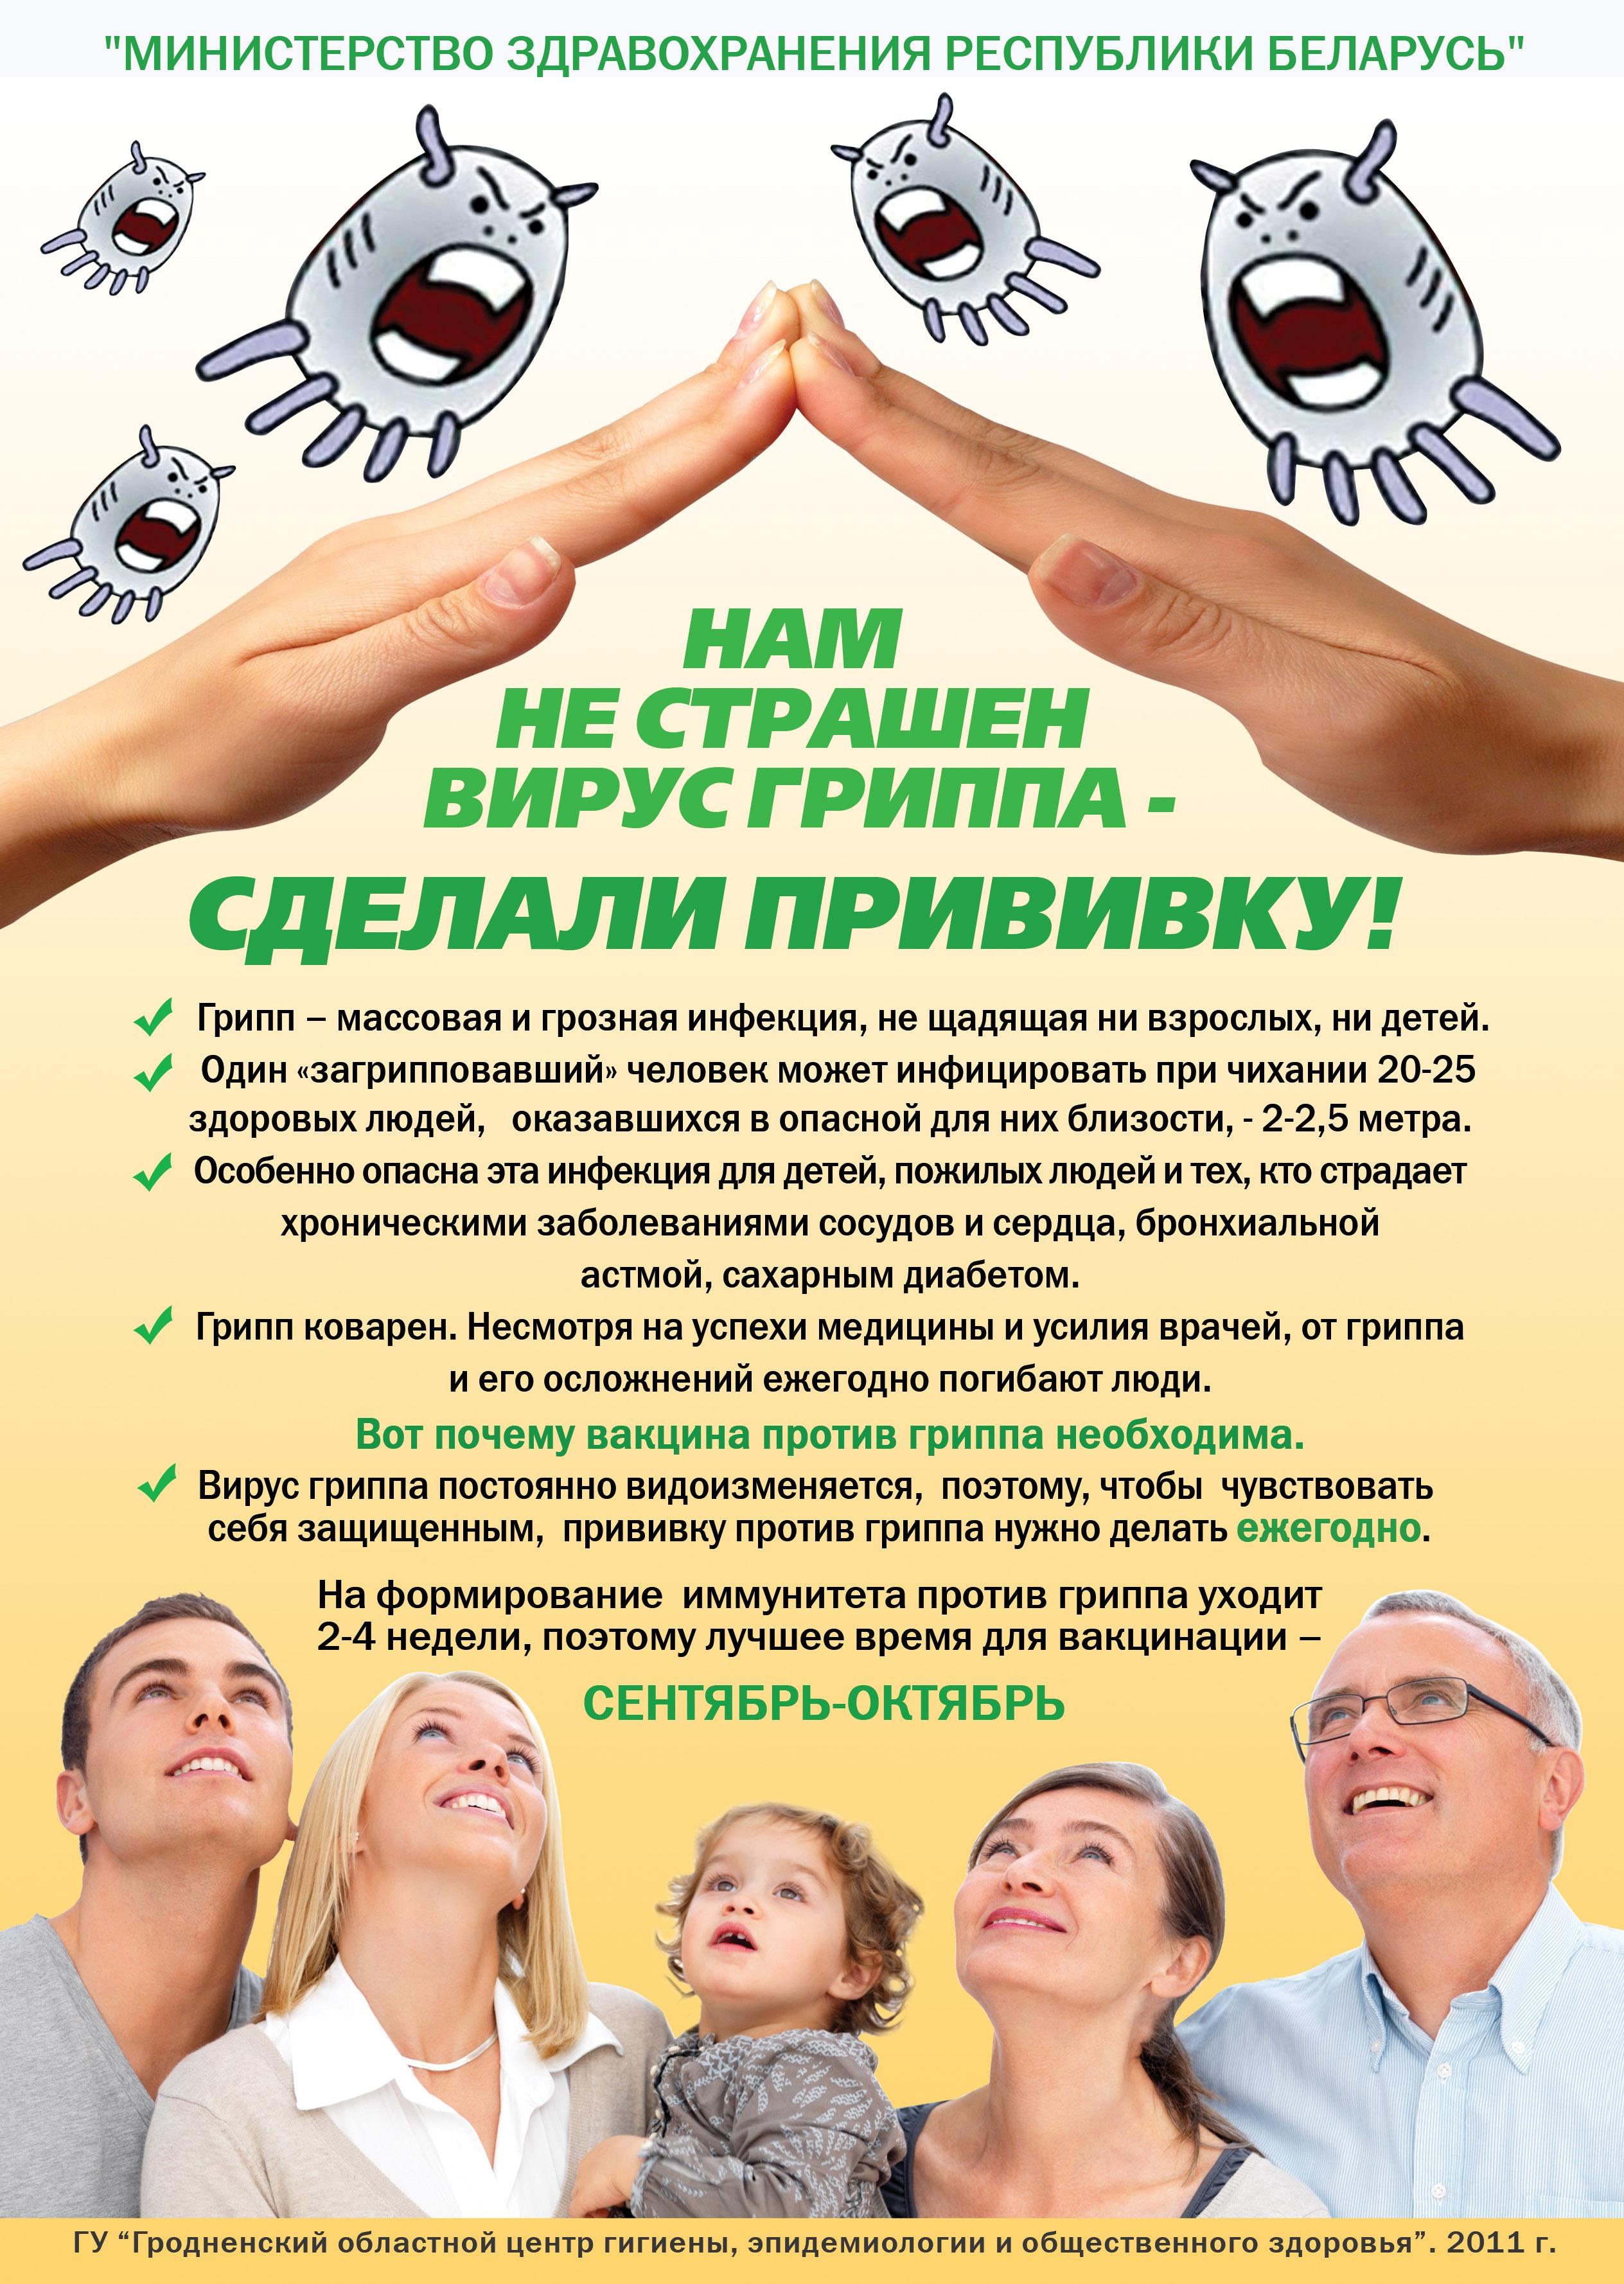 Grodno-privivka-a4-pechat-2011